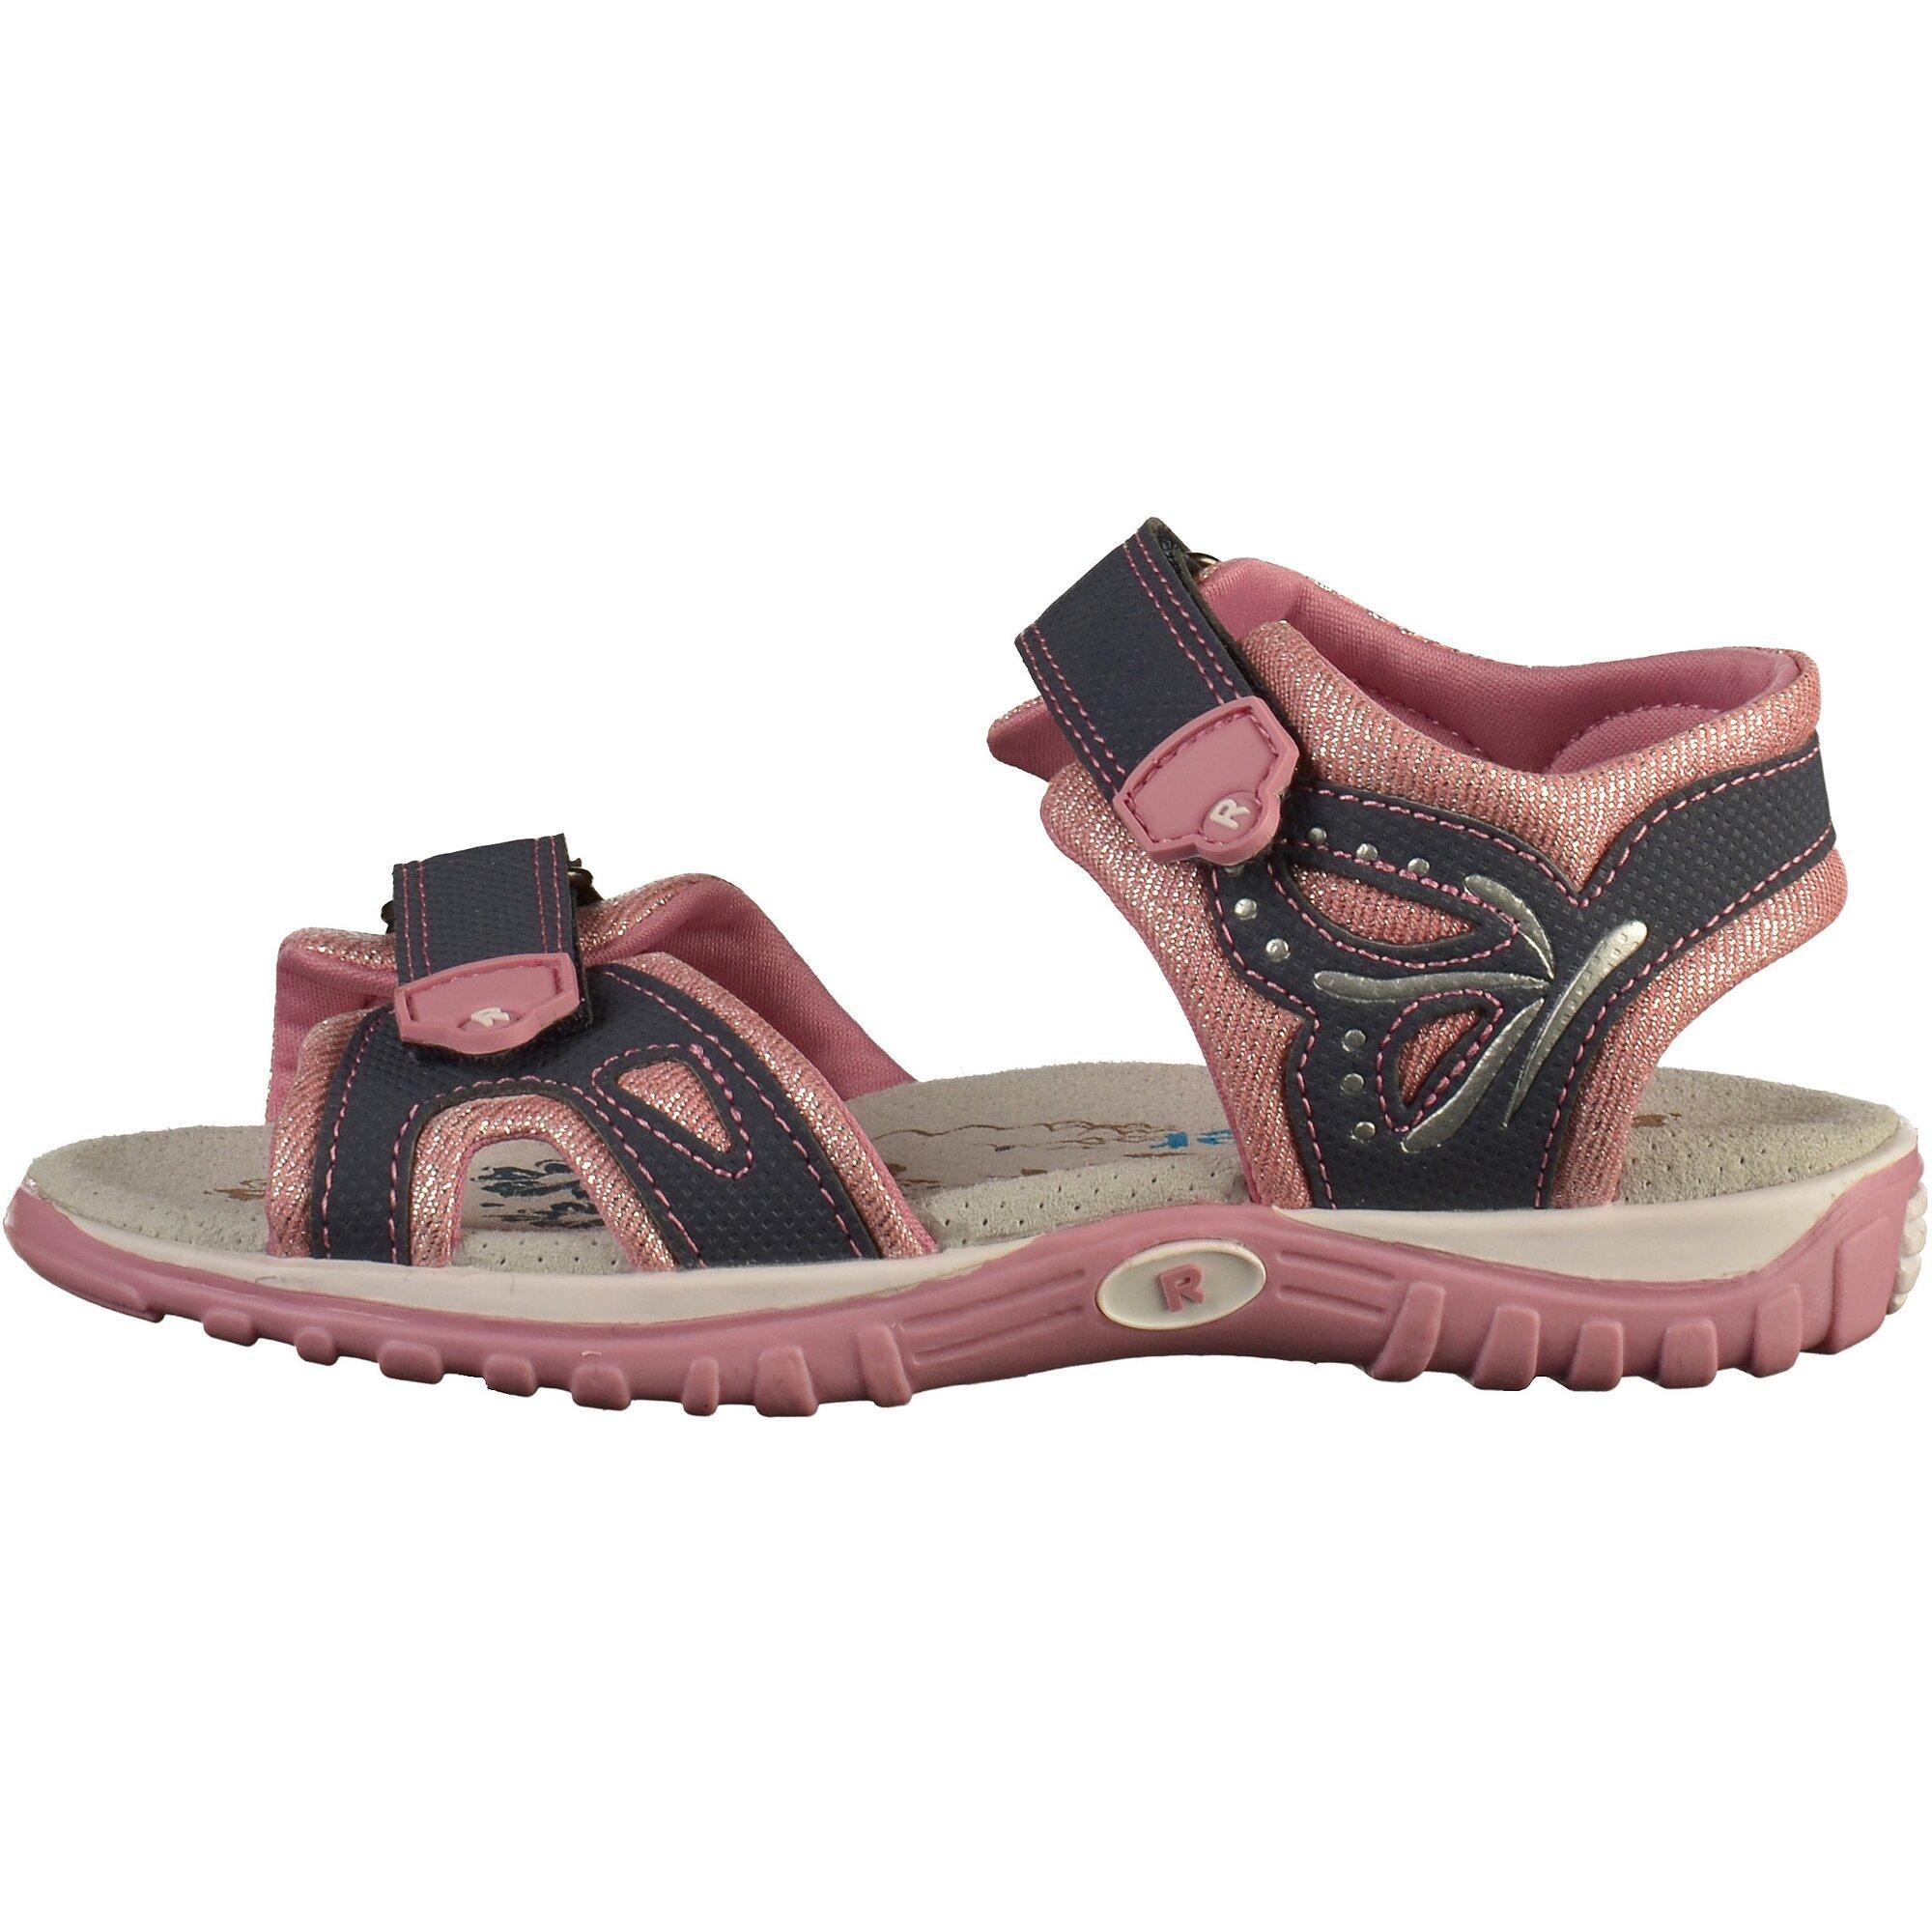 richter-kinderschuhe-sandalen, 59.95 EUR @ babywalz-de